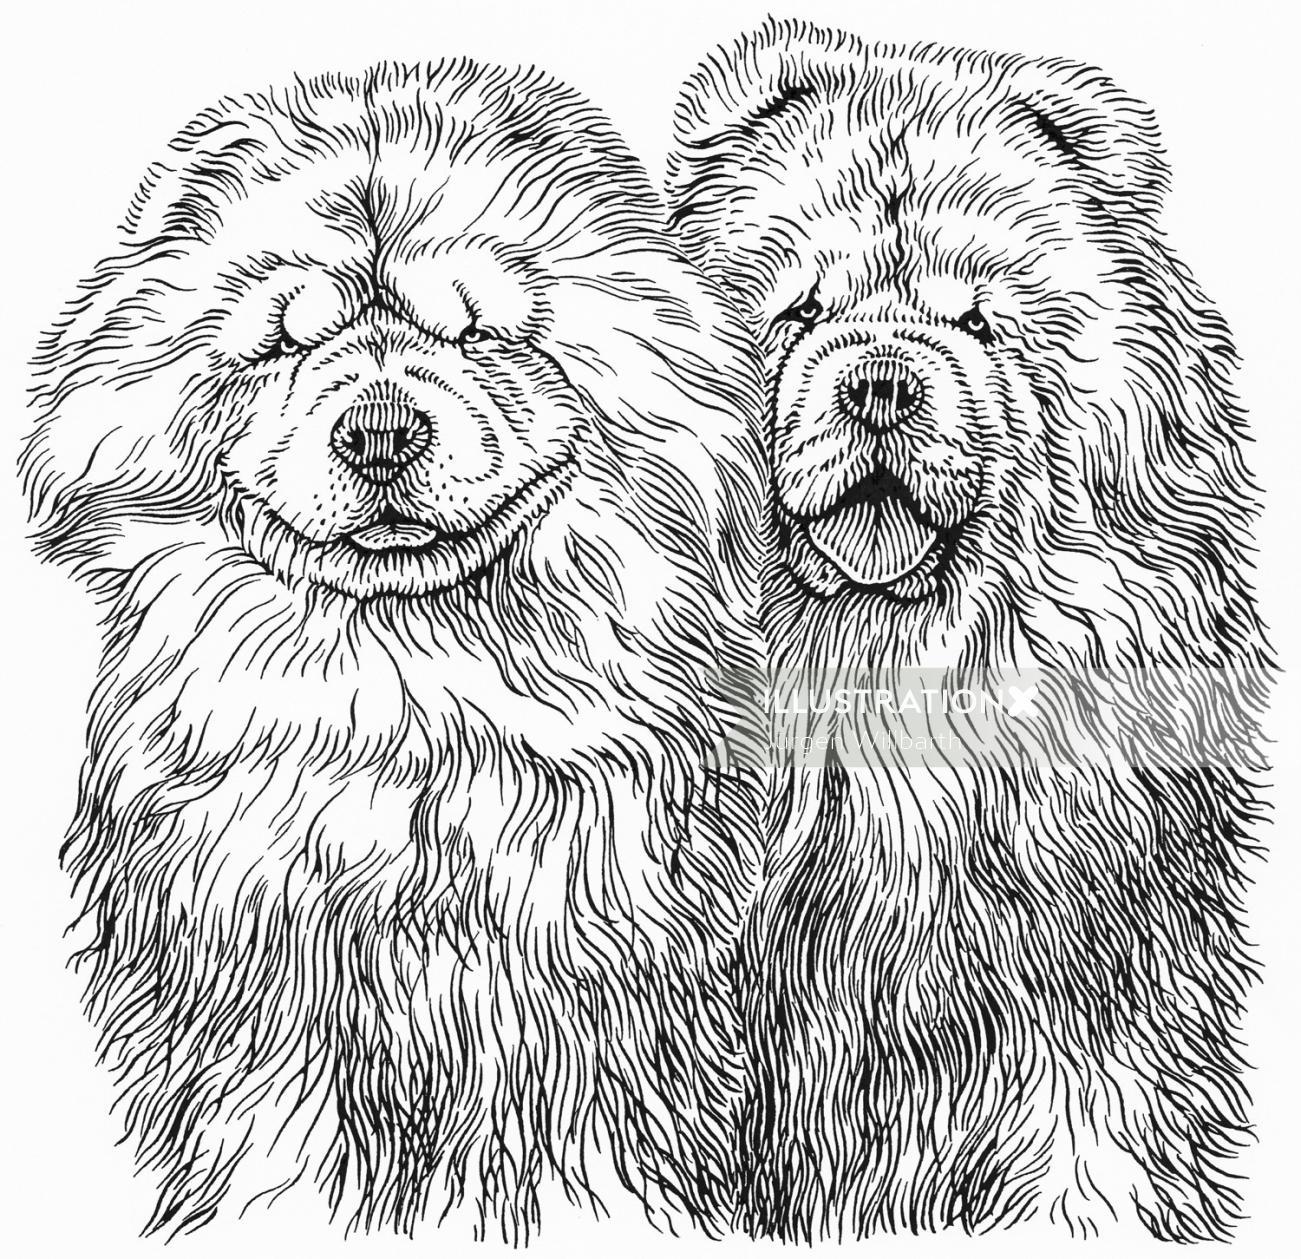 Dog illustration by Jürgen Willbarth